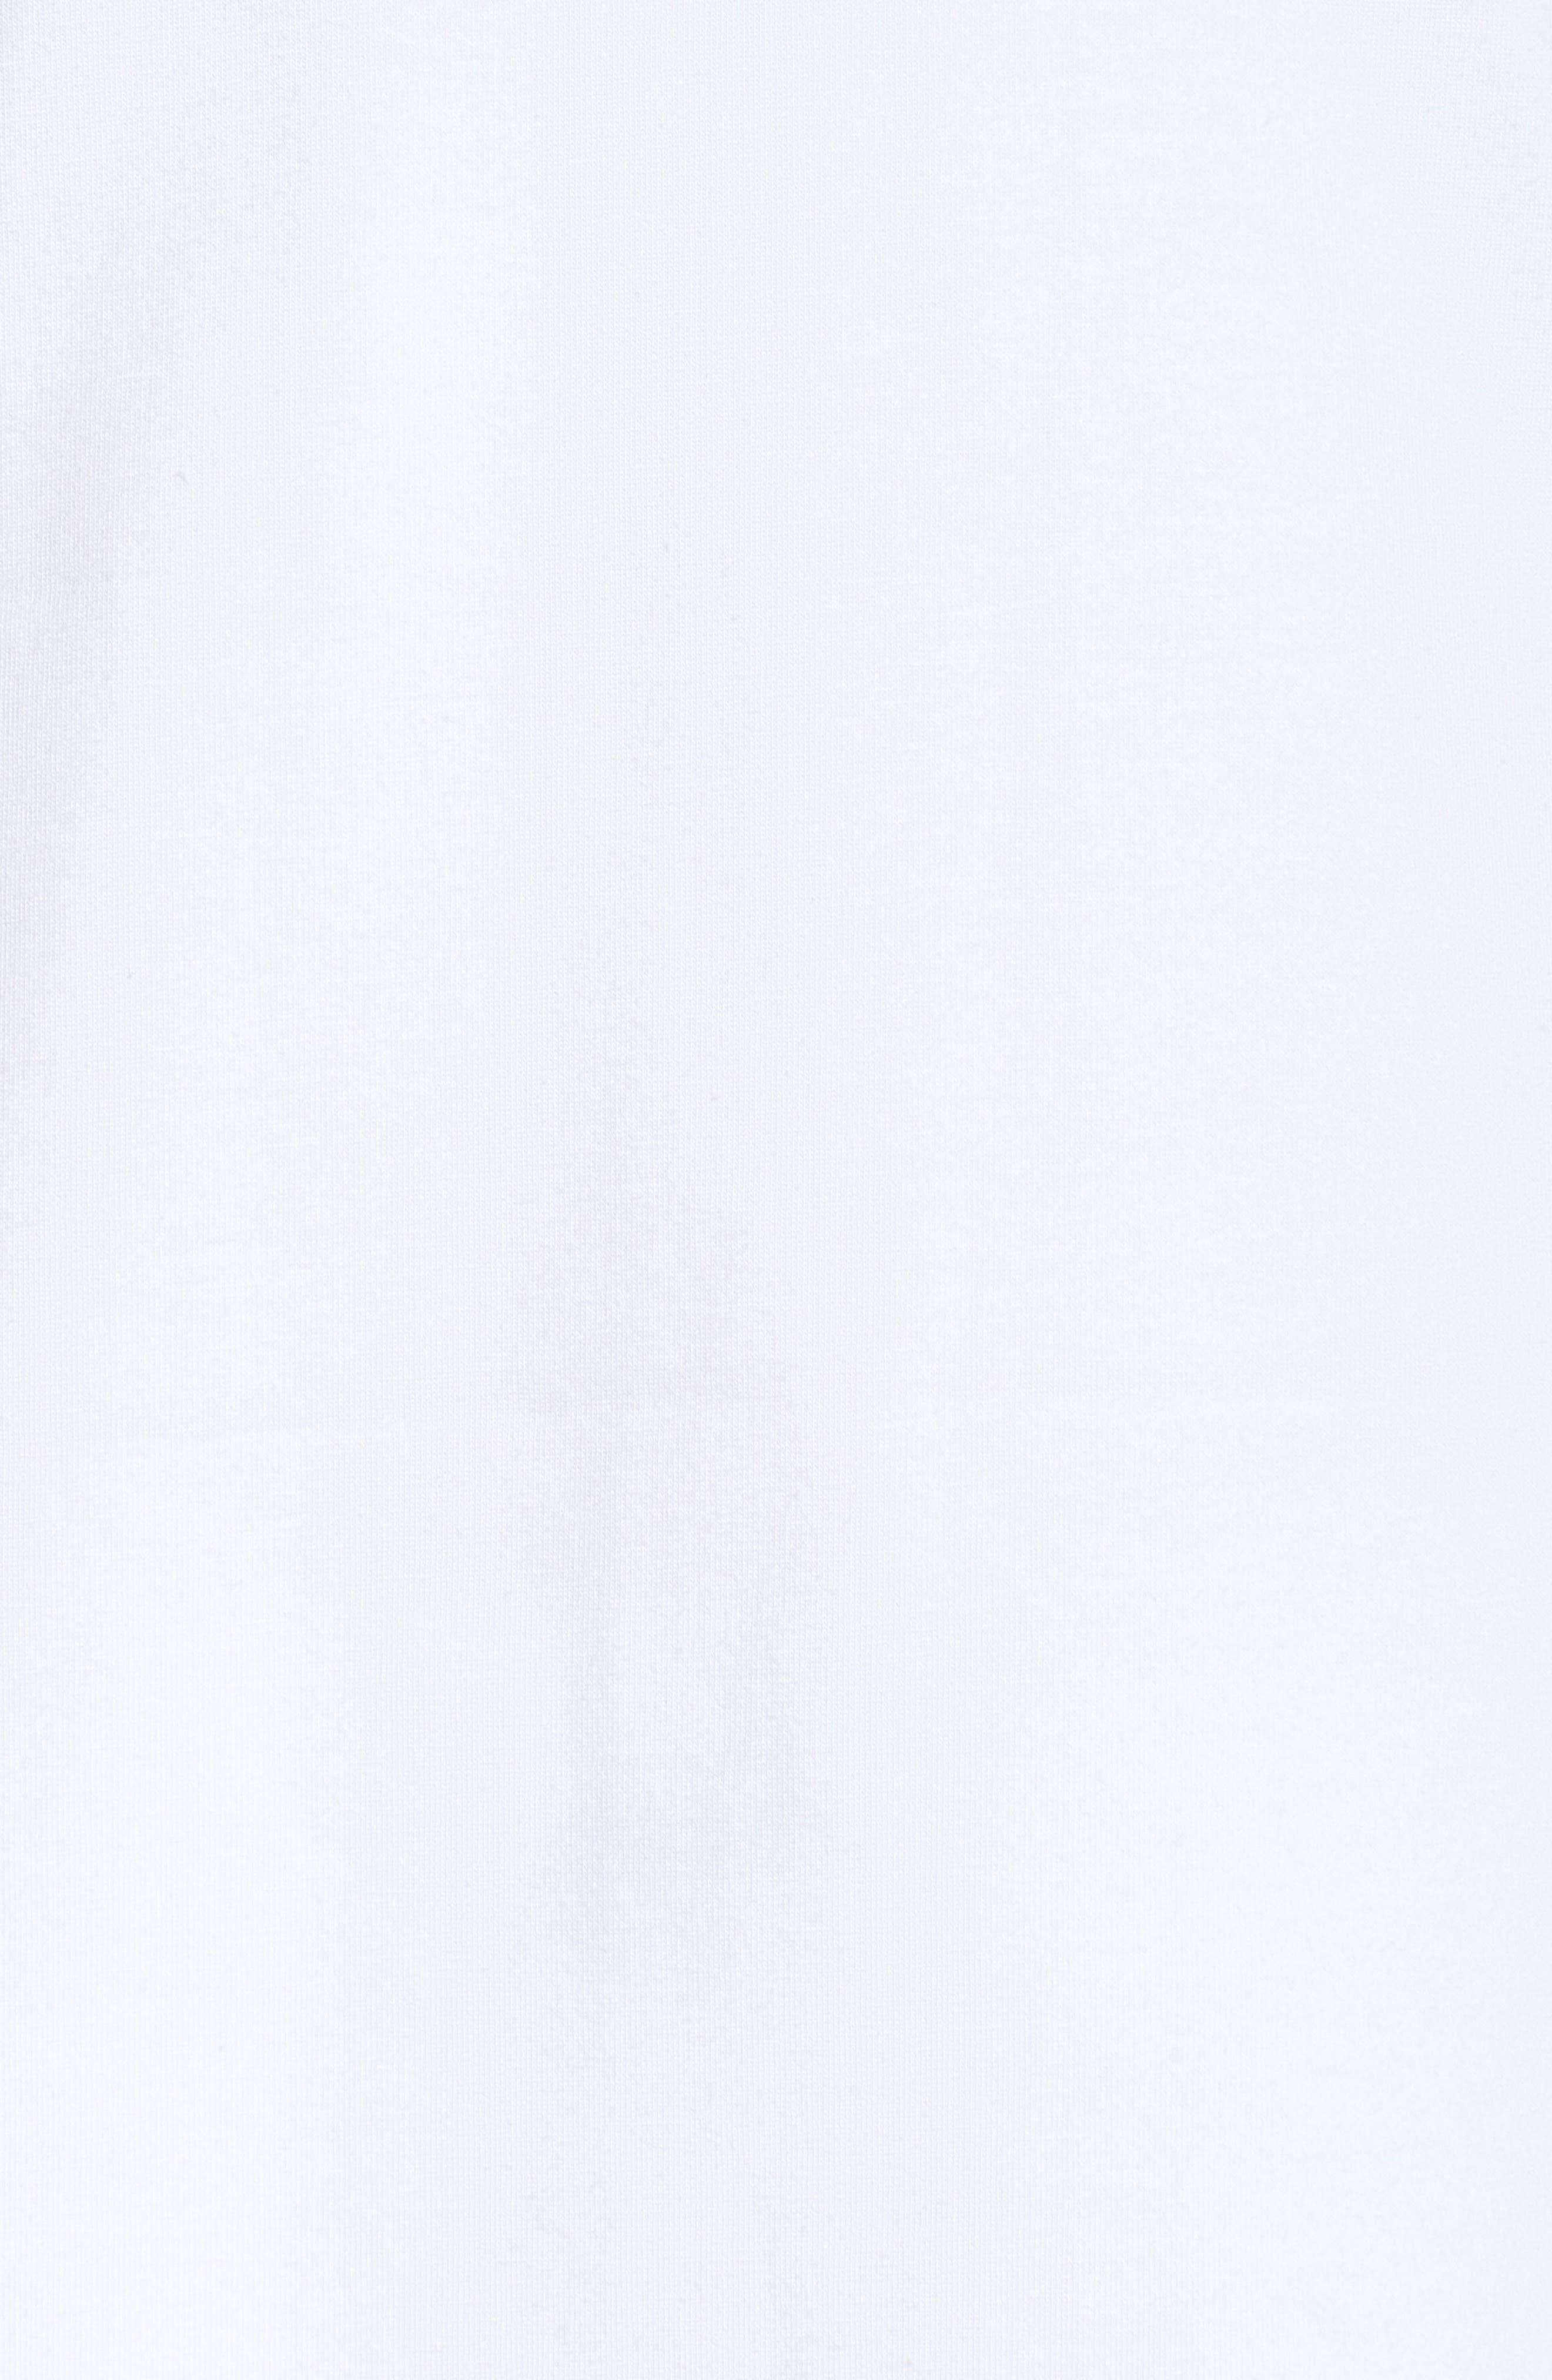 Bristol Pullover,                             Alternate thumbnail 3, color,                             White/ Black